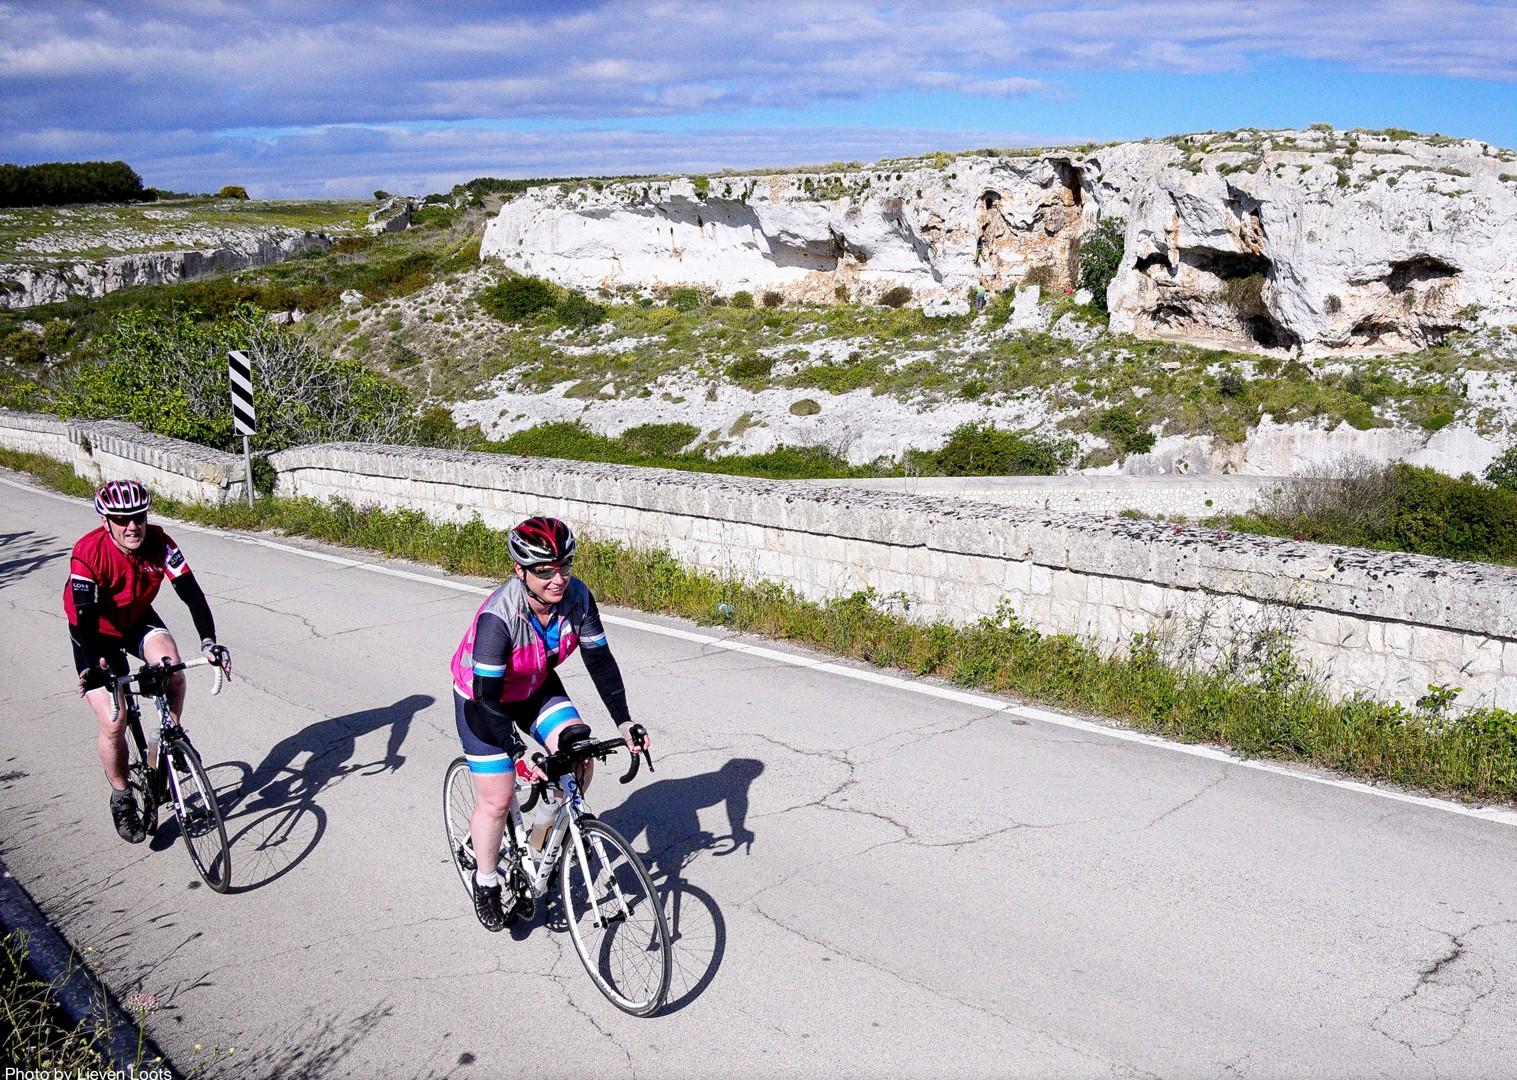 italy-road-cycling-holiday.jpg - Italy - Puglia - The Heel of Italy - Self-Guided Road Cycling Holiday - Road Cycling